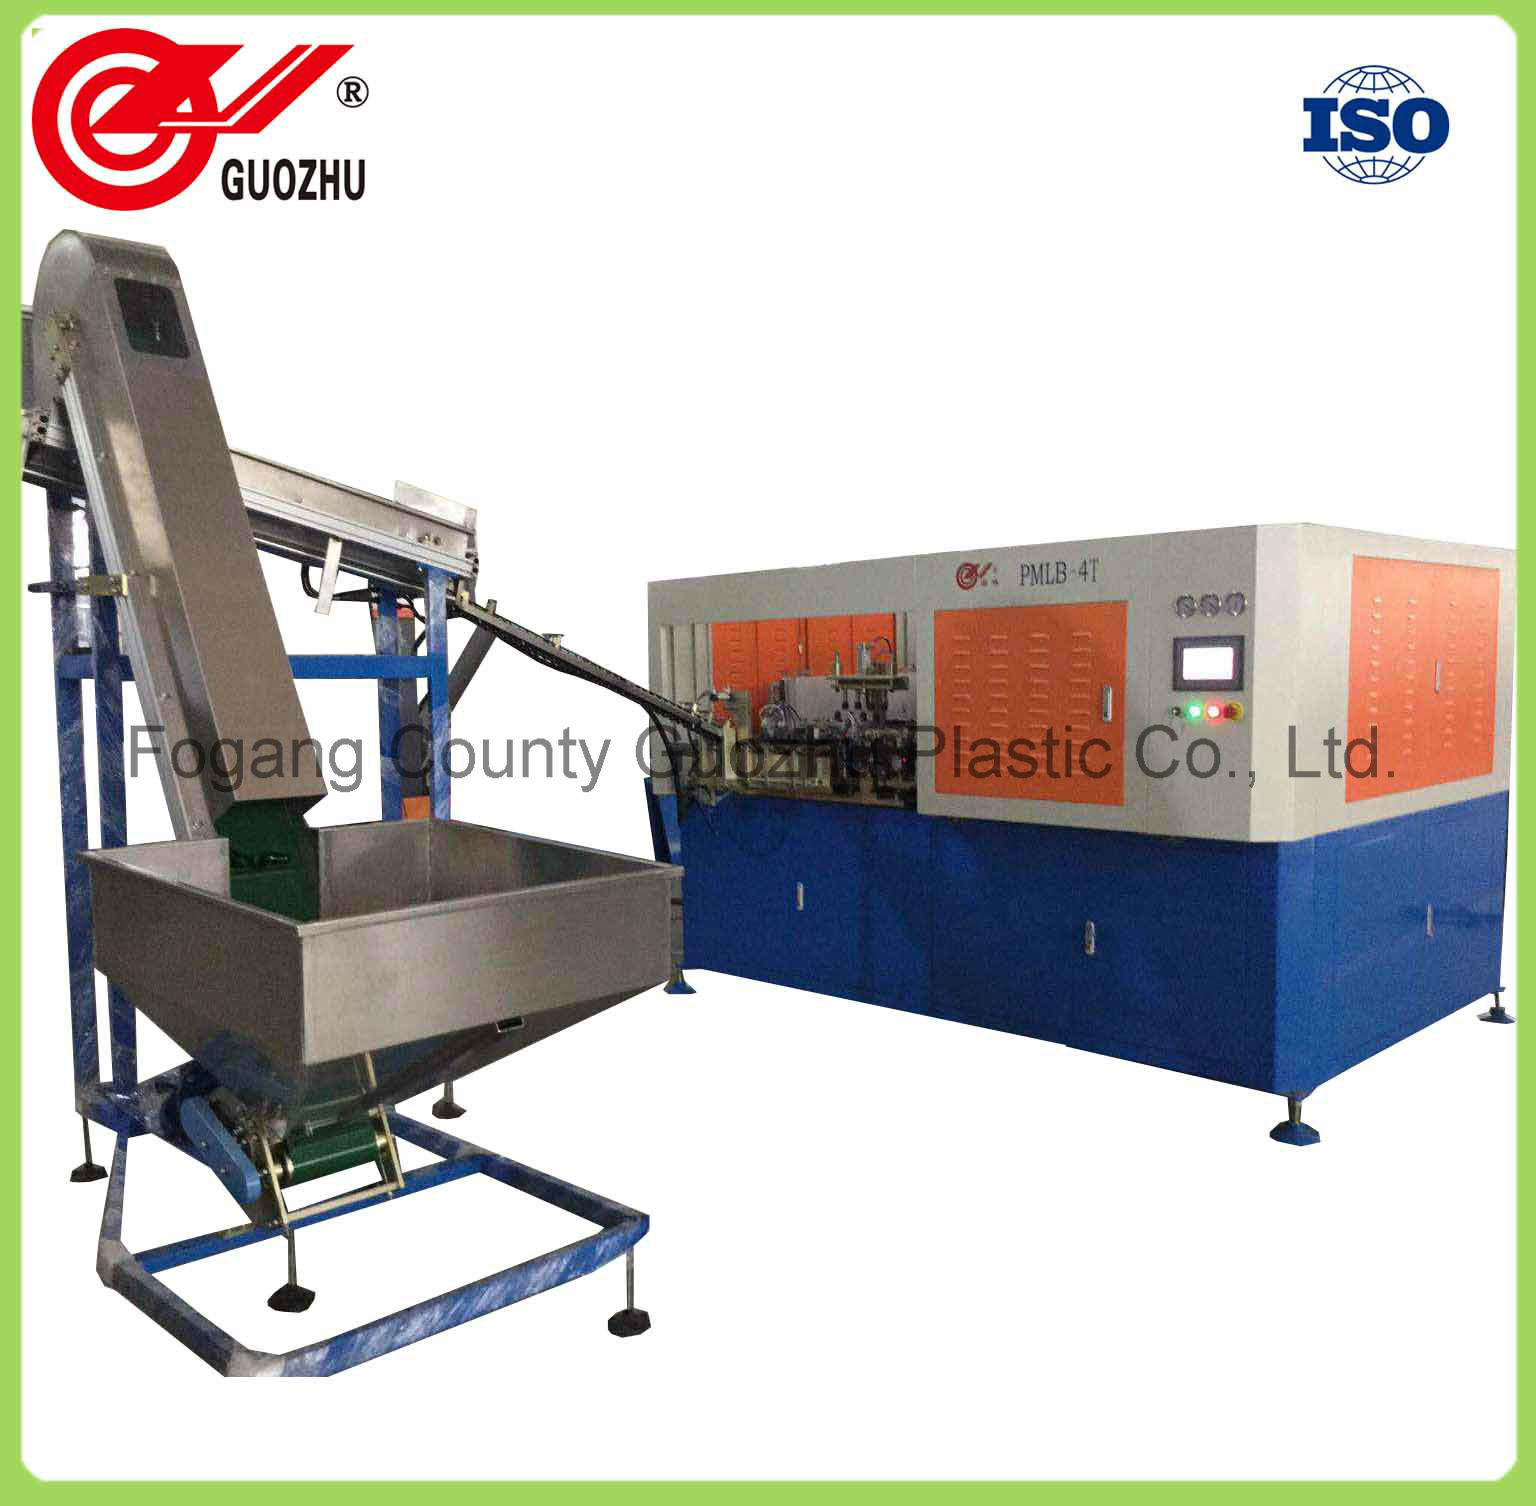 Guozhu Automatic 650ml Pet Beverage Bottle Stretch Blow Molding Machine Manufacturer